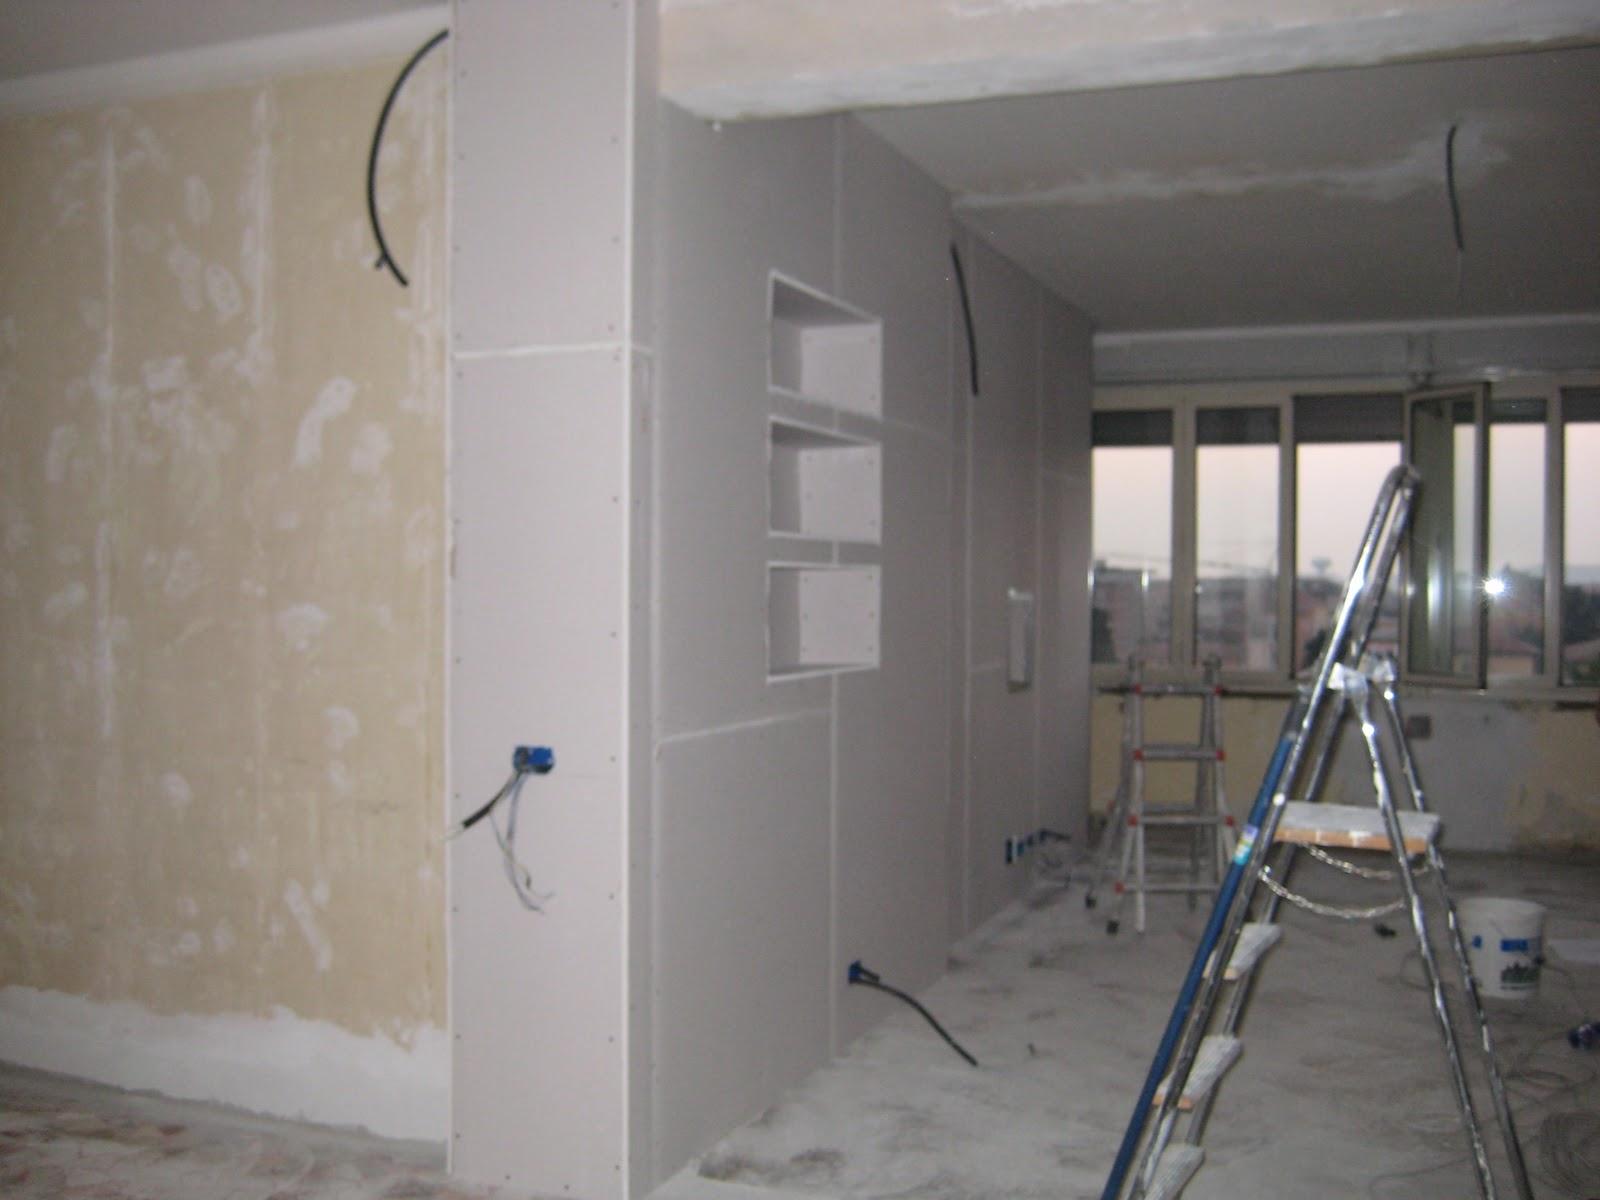 Pannello porta tv in cartongesso pareti attrezzate in cartongesso roma mobili cartongesso - Pareti mobili in cartongesso ...